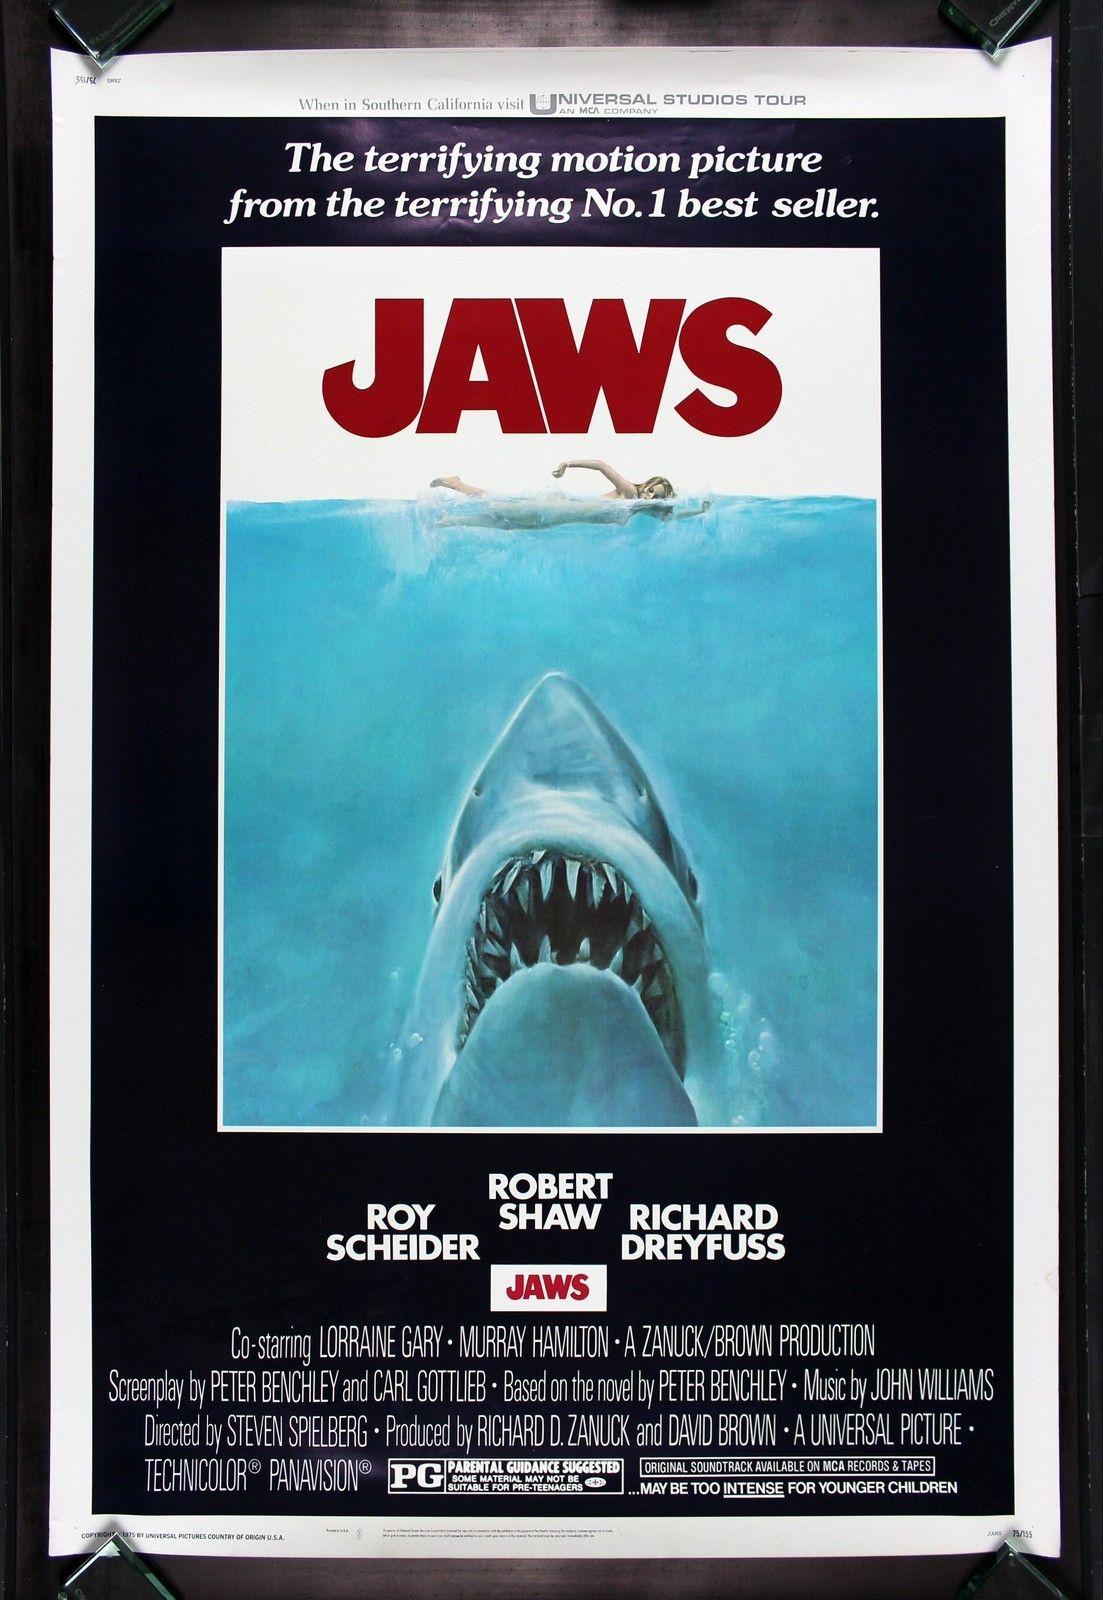 Jaws Cinemasterpieces Huge 40x60 Original Shark Movie Poster 1975 Spielberg Ebay Jaws Movie Poster Classic Movie Posters Iconic Movie Posters